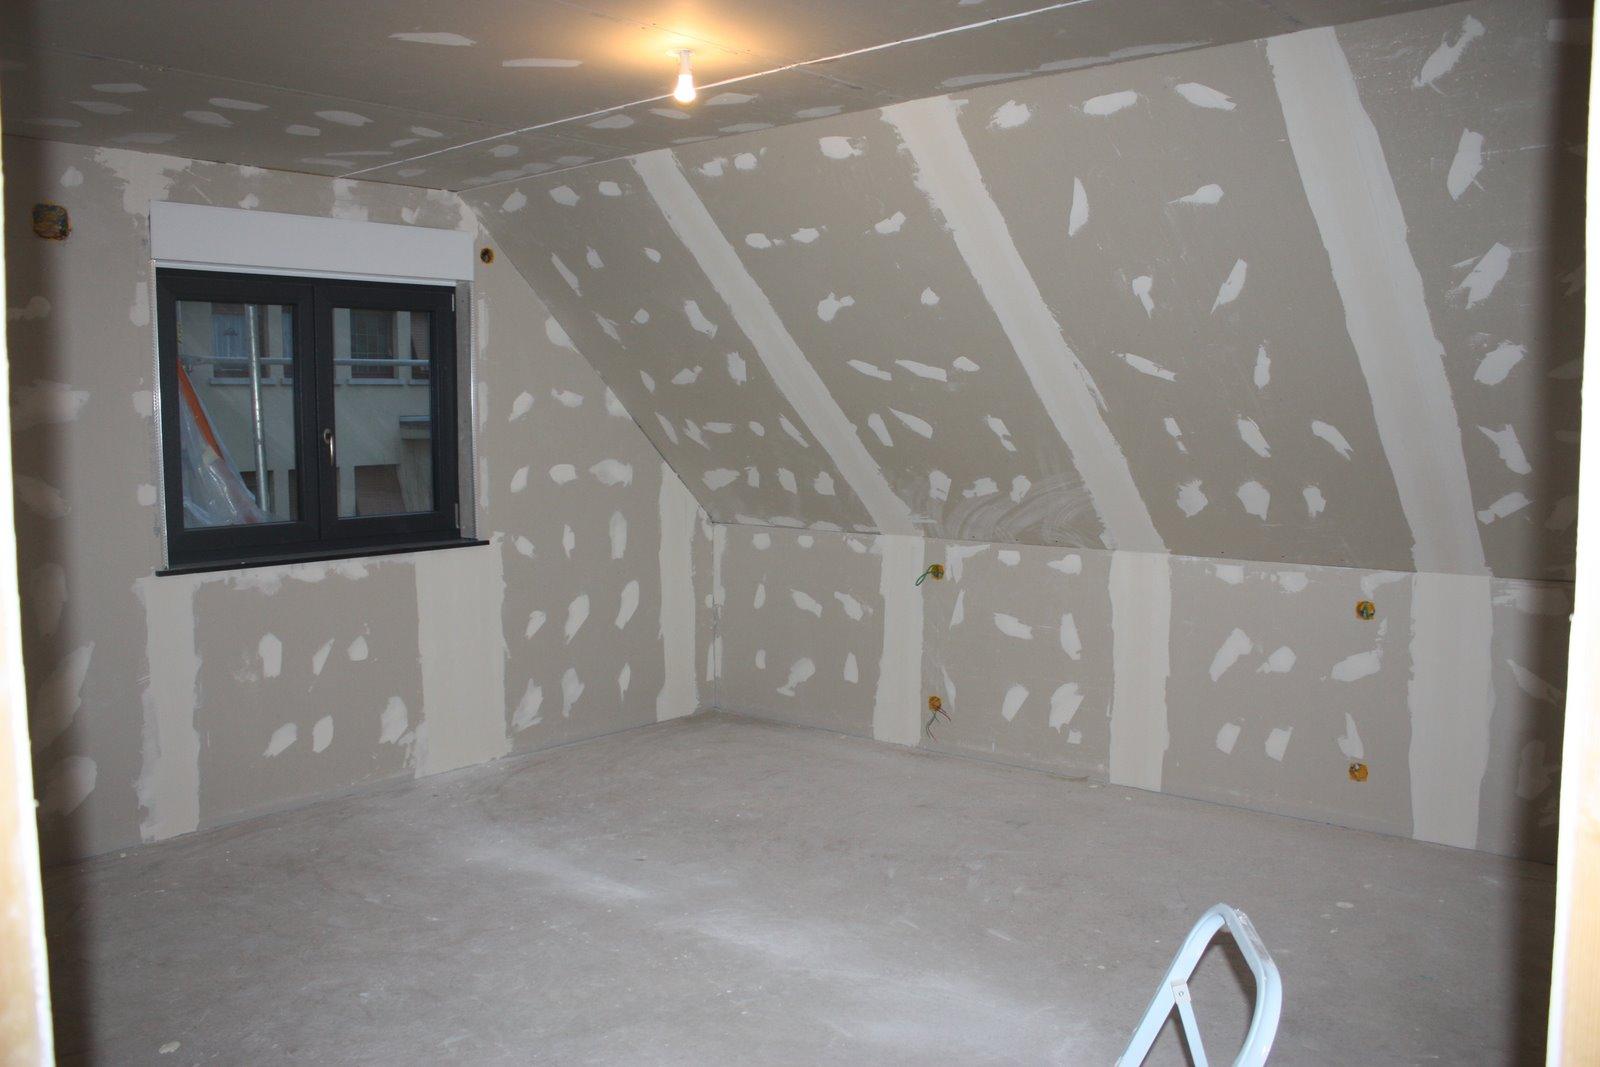 mob ossature bois isolation energie domotique bbc knx alsace placo les joints. Black Bedroom Furniture Sets. Home Design Ideas